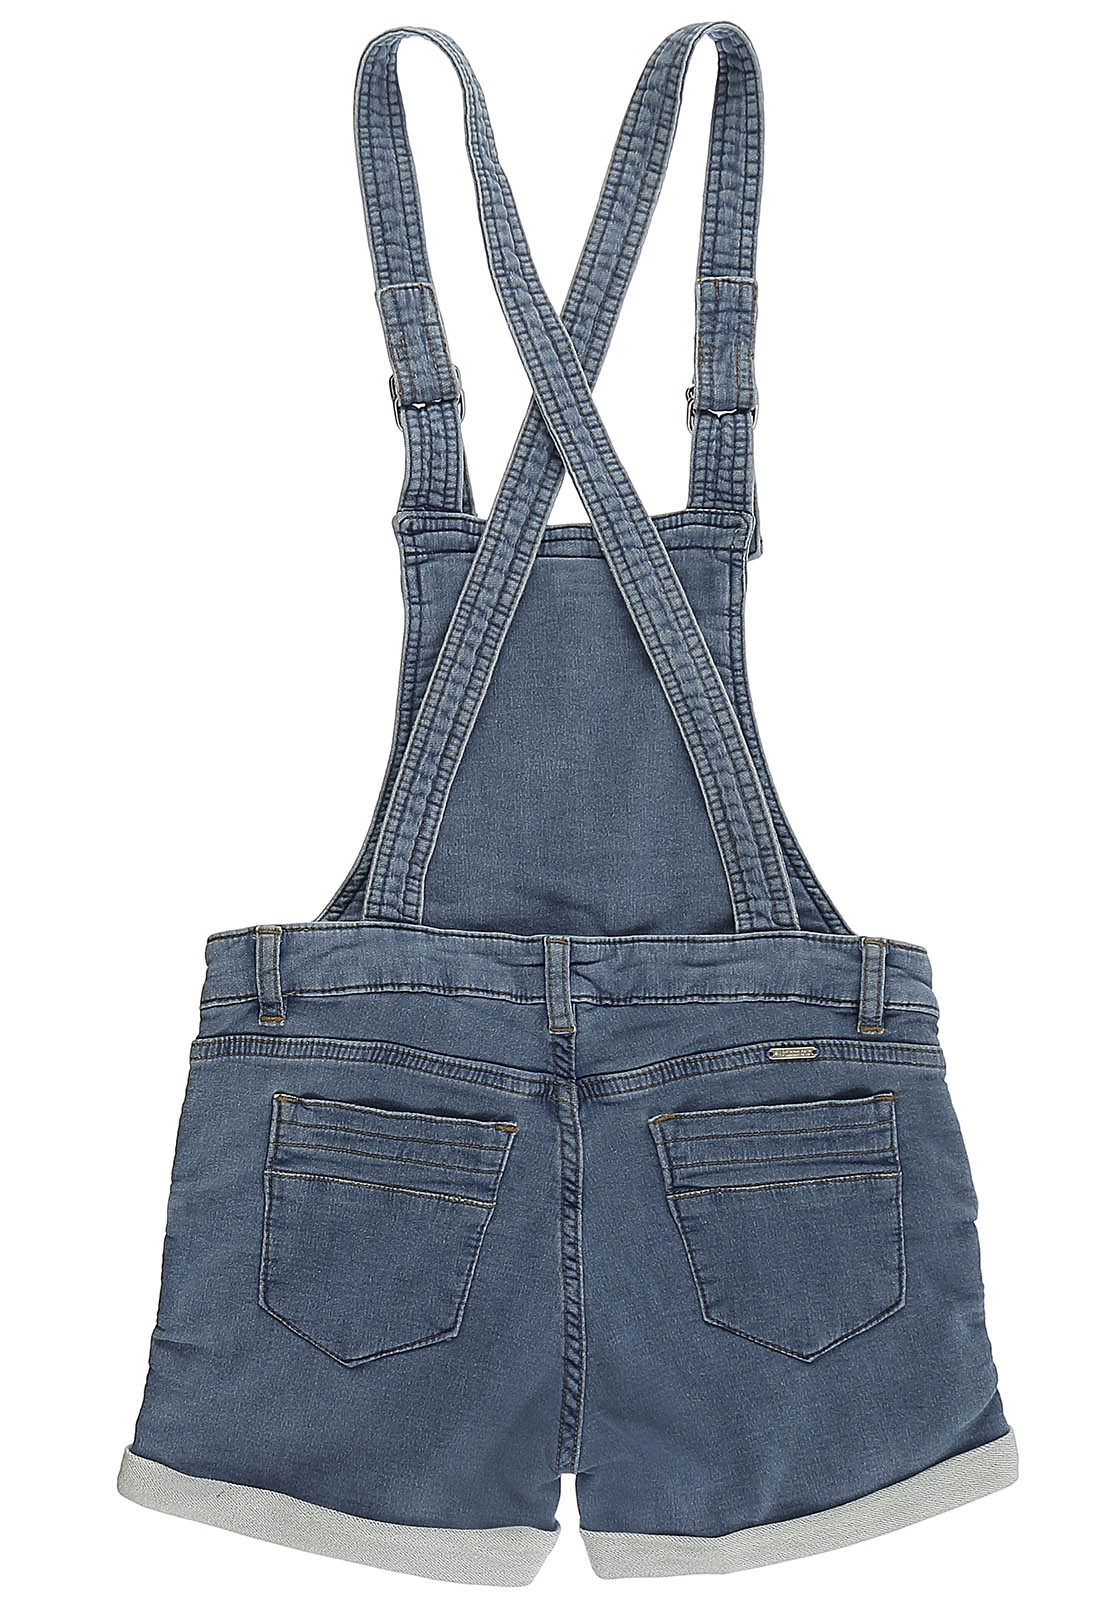 Jardineira Crawling Jeans Comfty Feminina